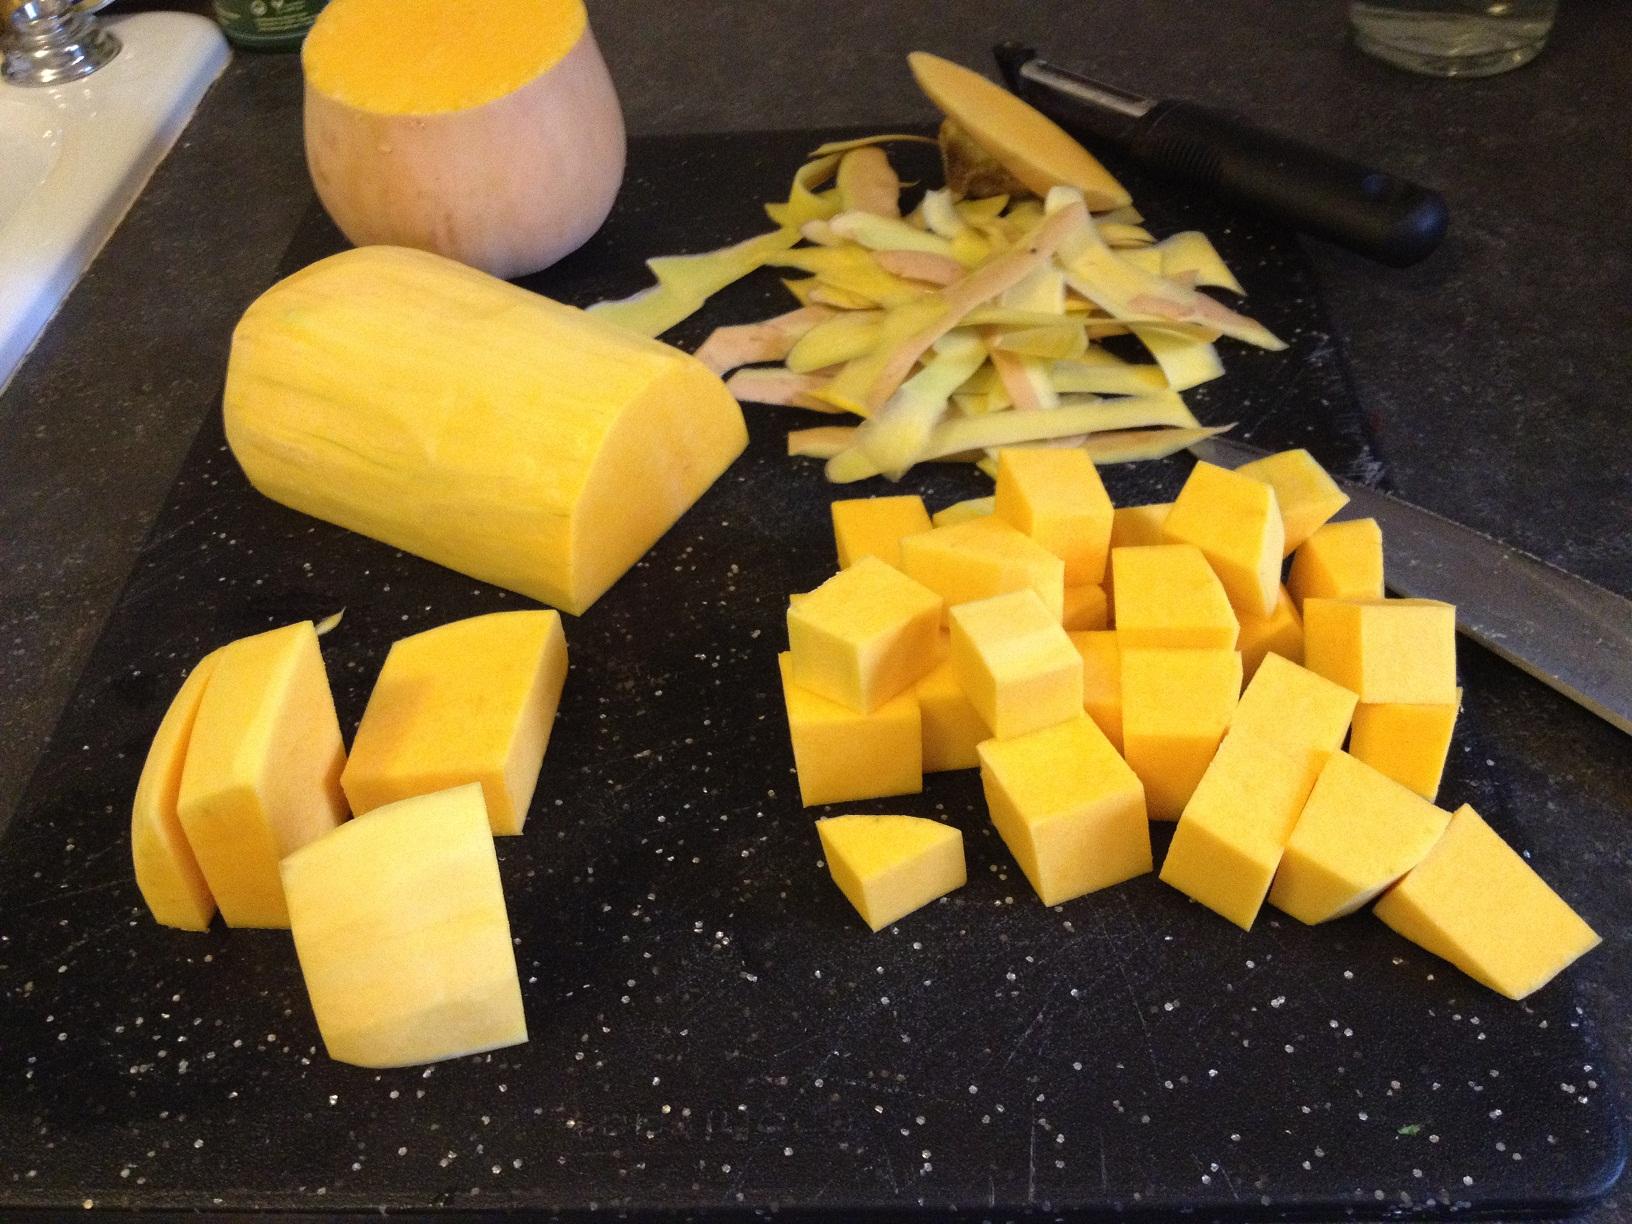 Prepping the Butternut Squash